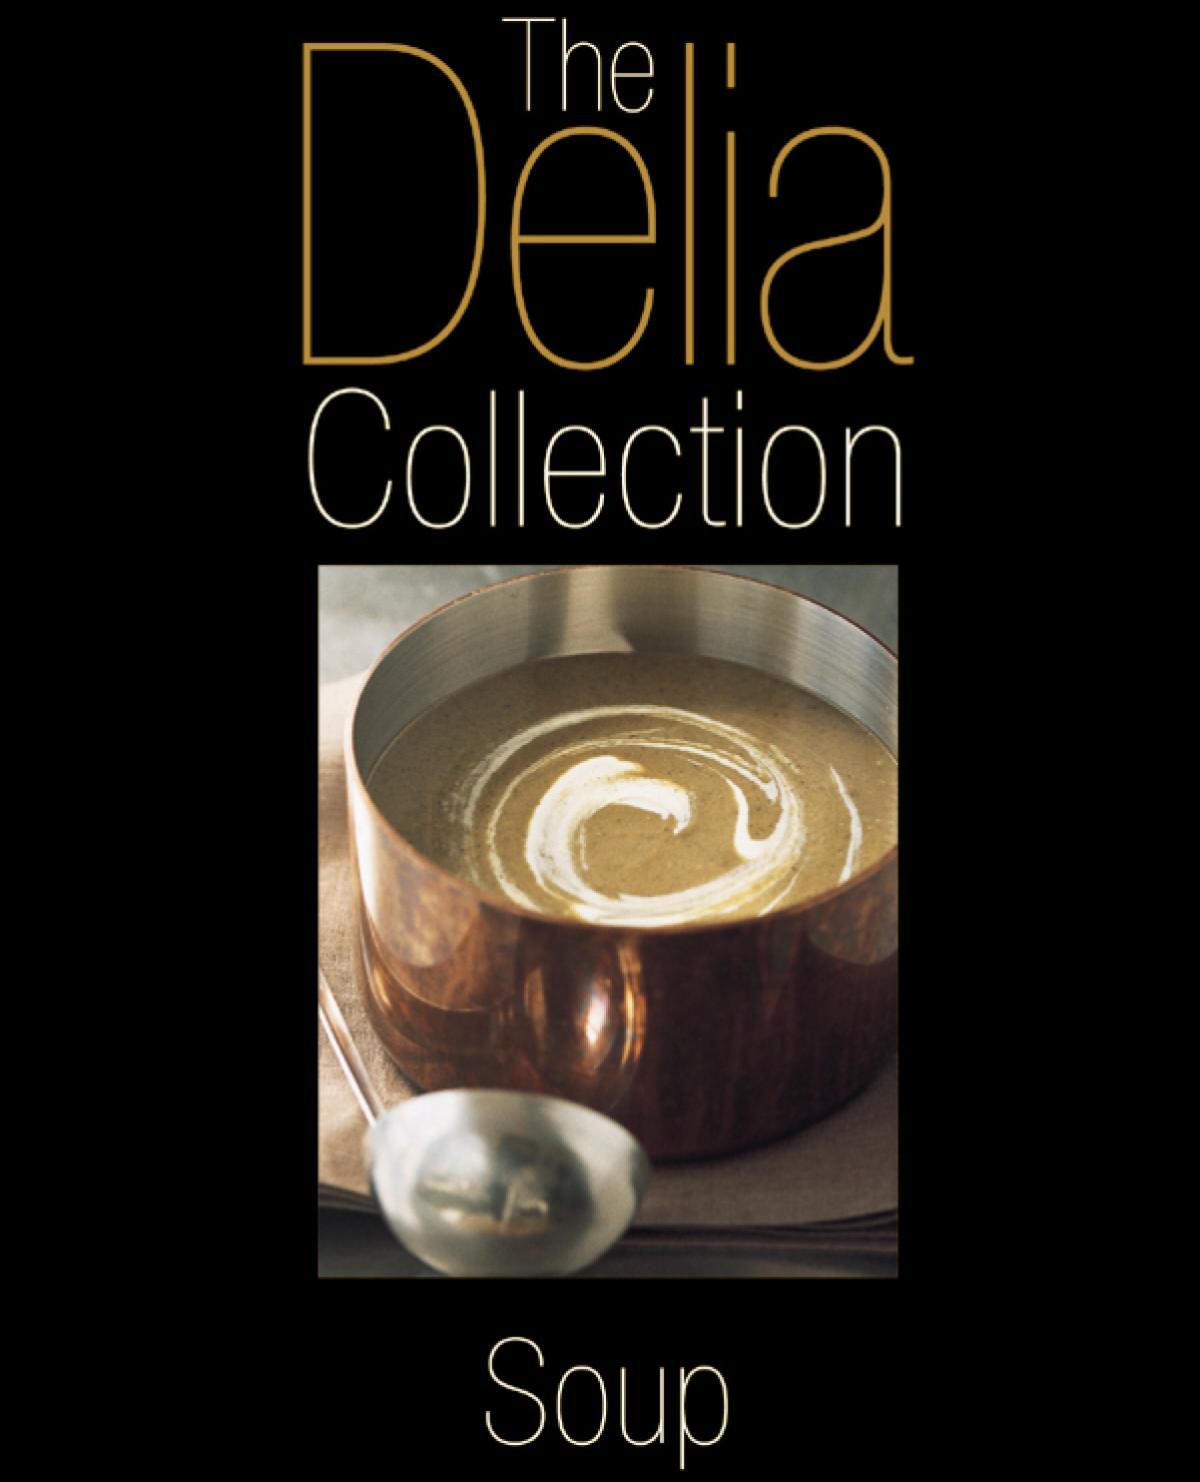 A picture of Delia's The Delia Collection: Soup recipes